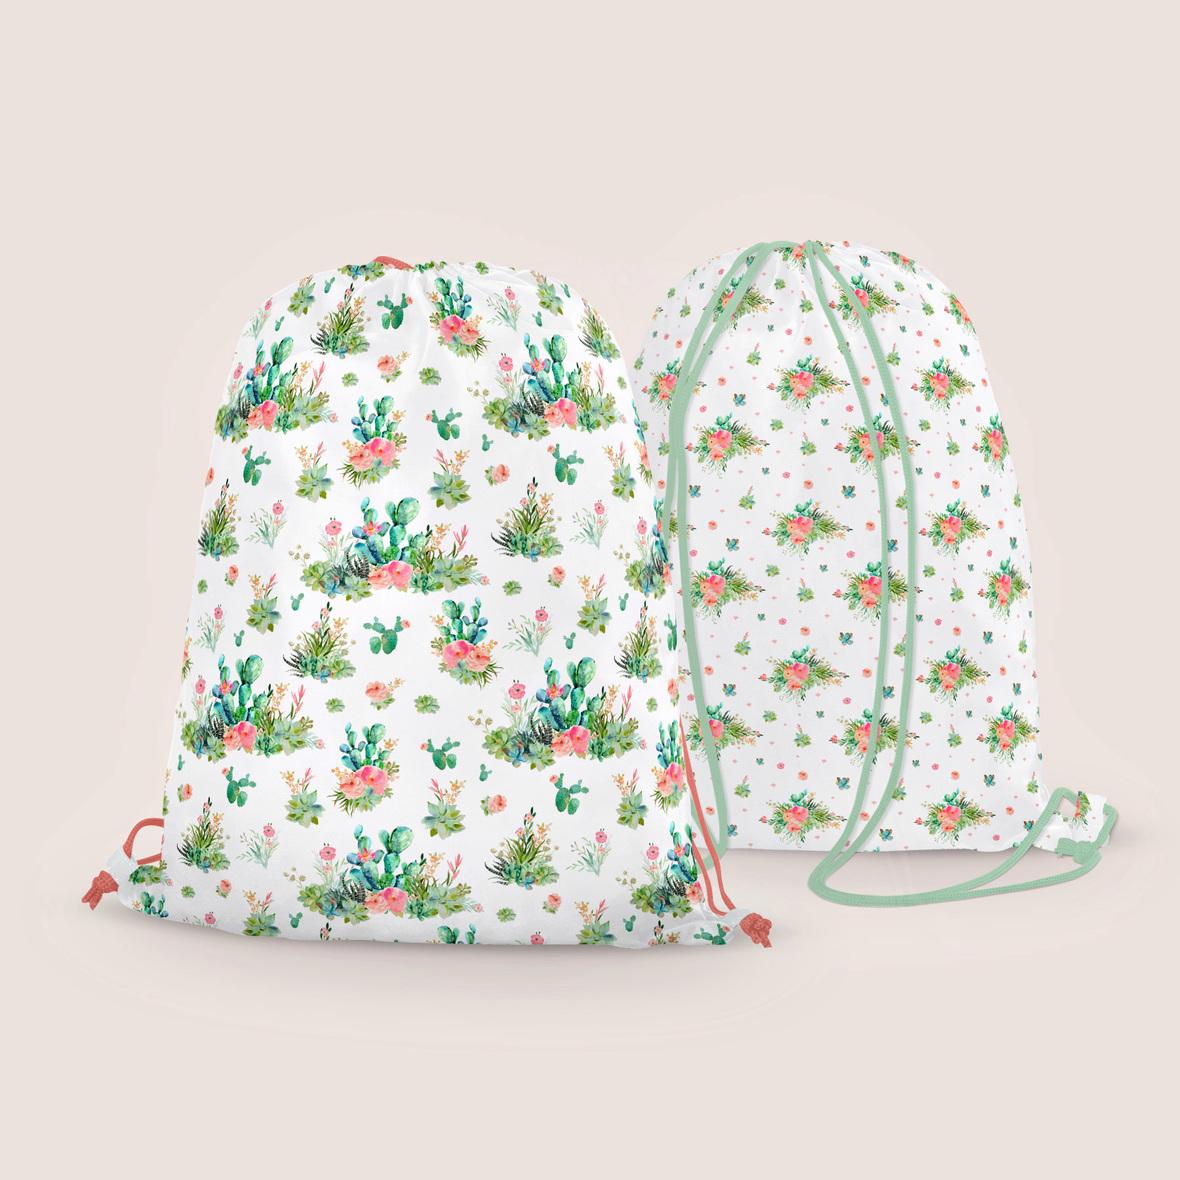 Western boho floral  Drawstring bags 2.1